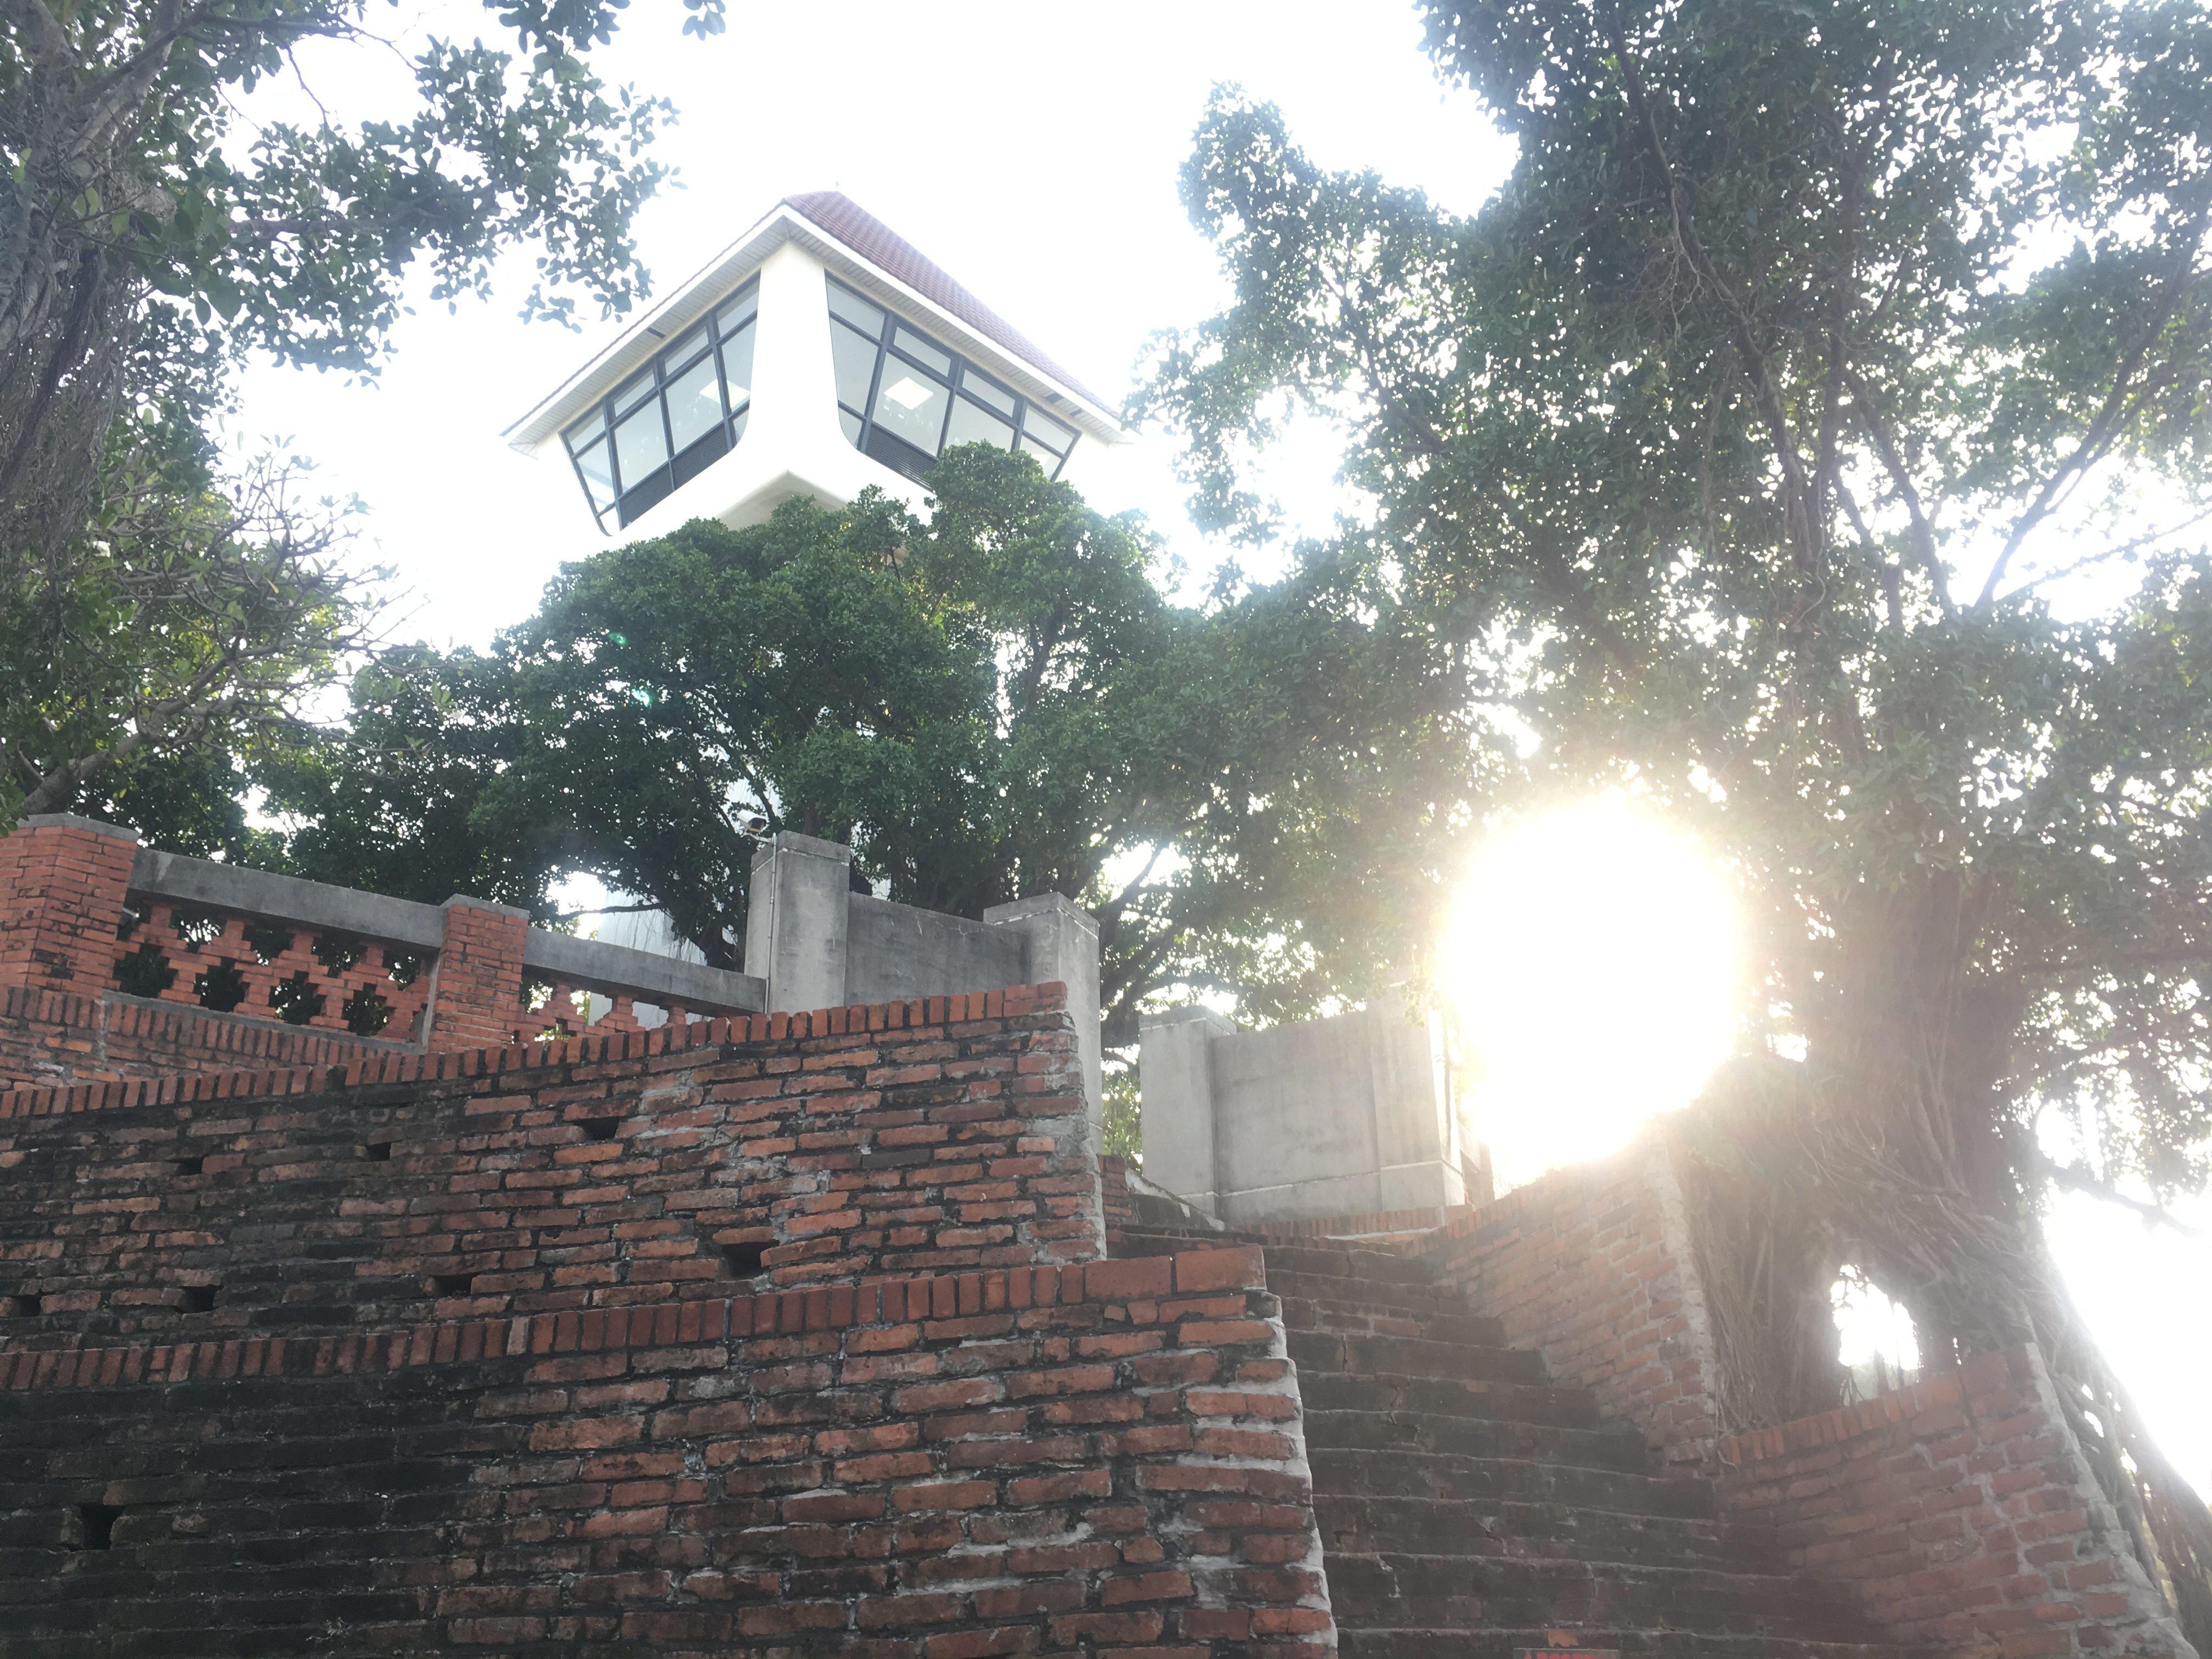 Tower at Fort Zeelandia, Tainan, Taiwan